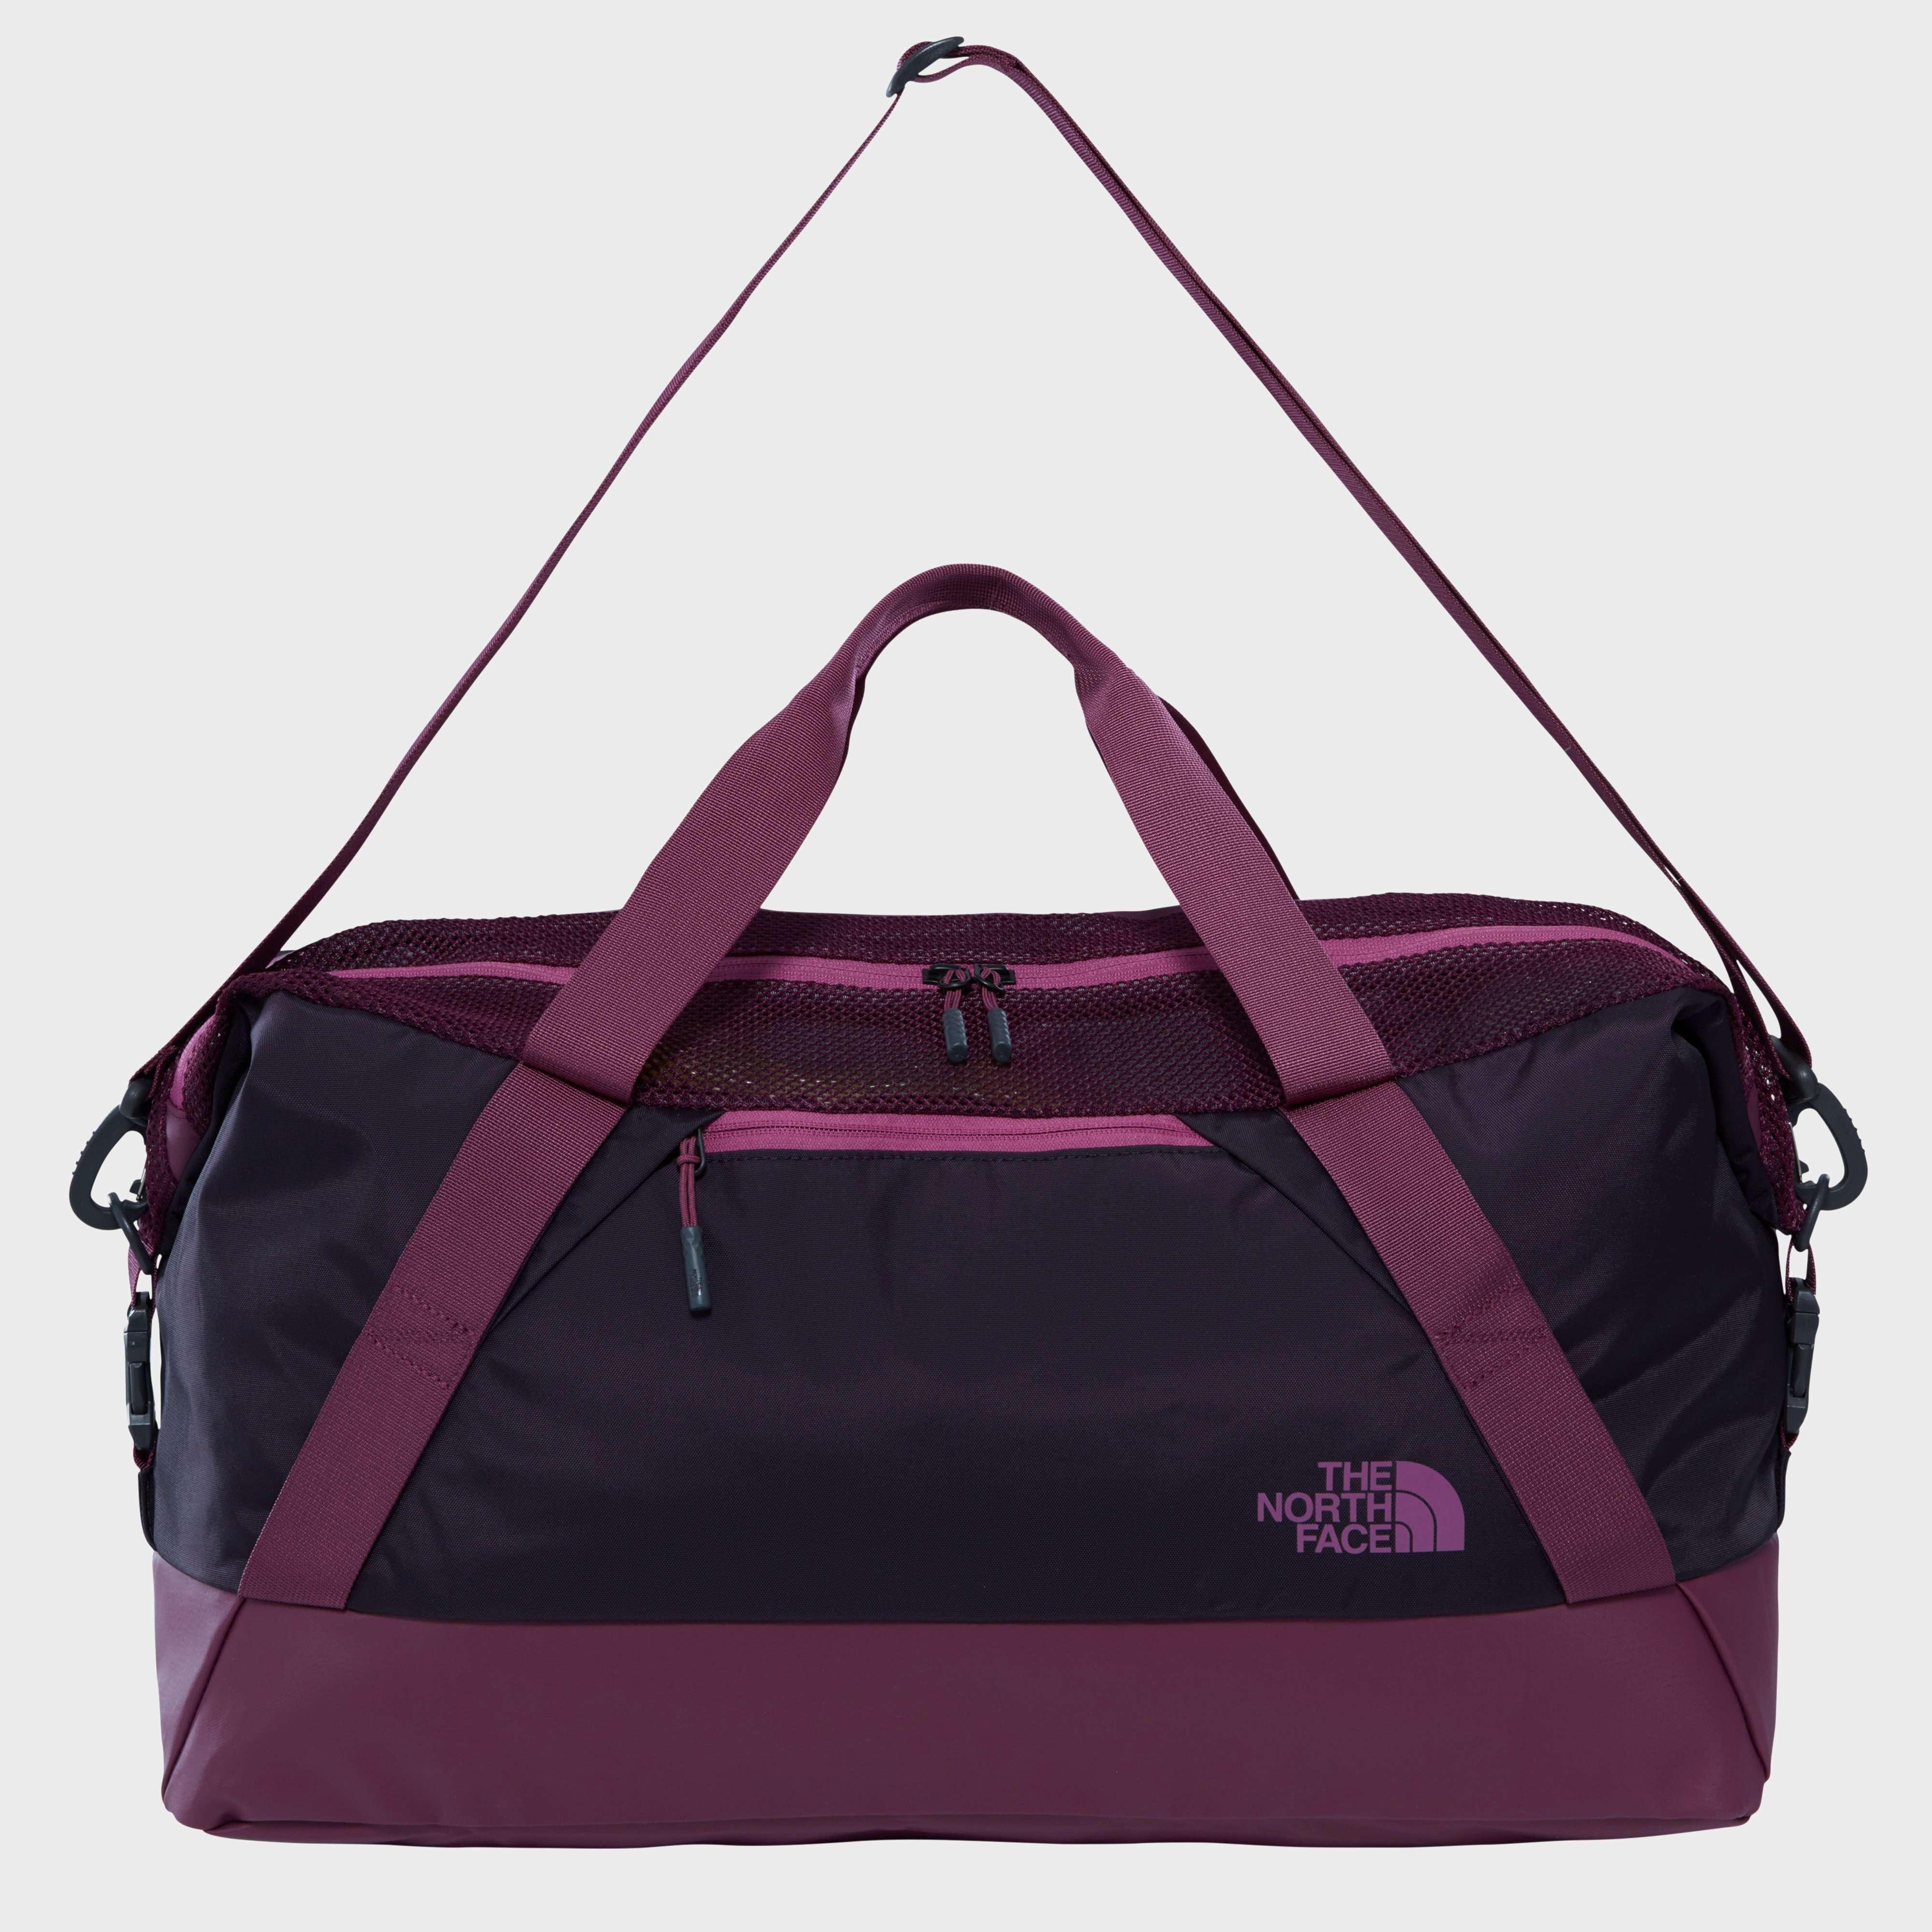 THE NORTH FACE Apex Gym Duffel Bag (Medium)